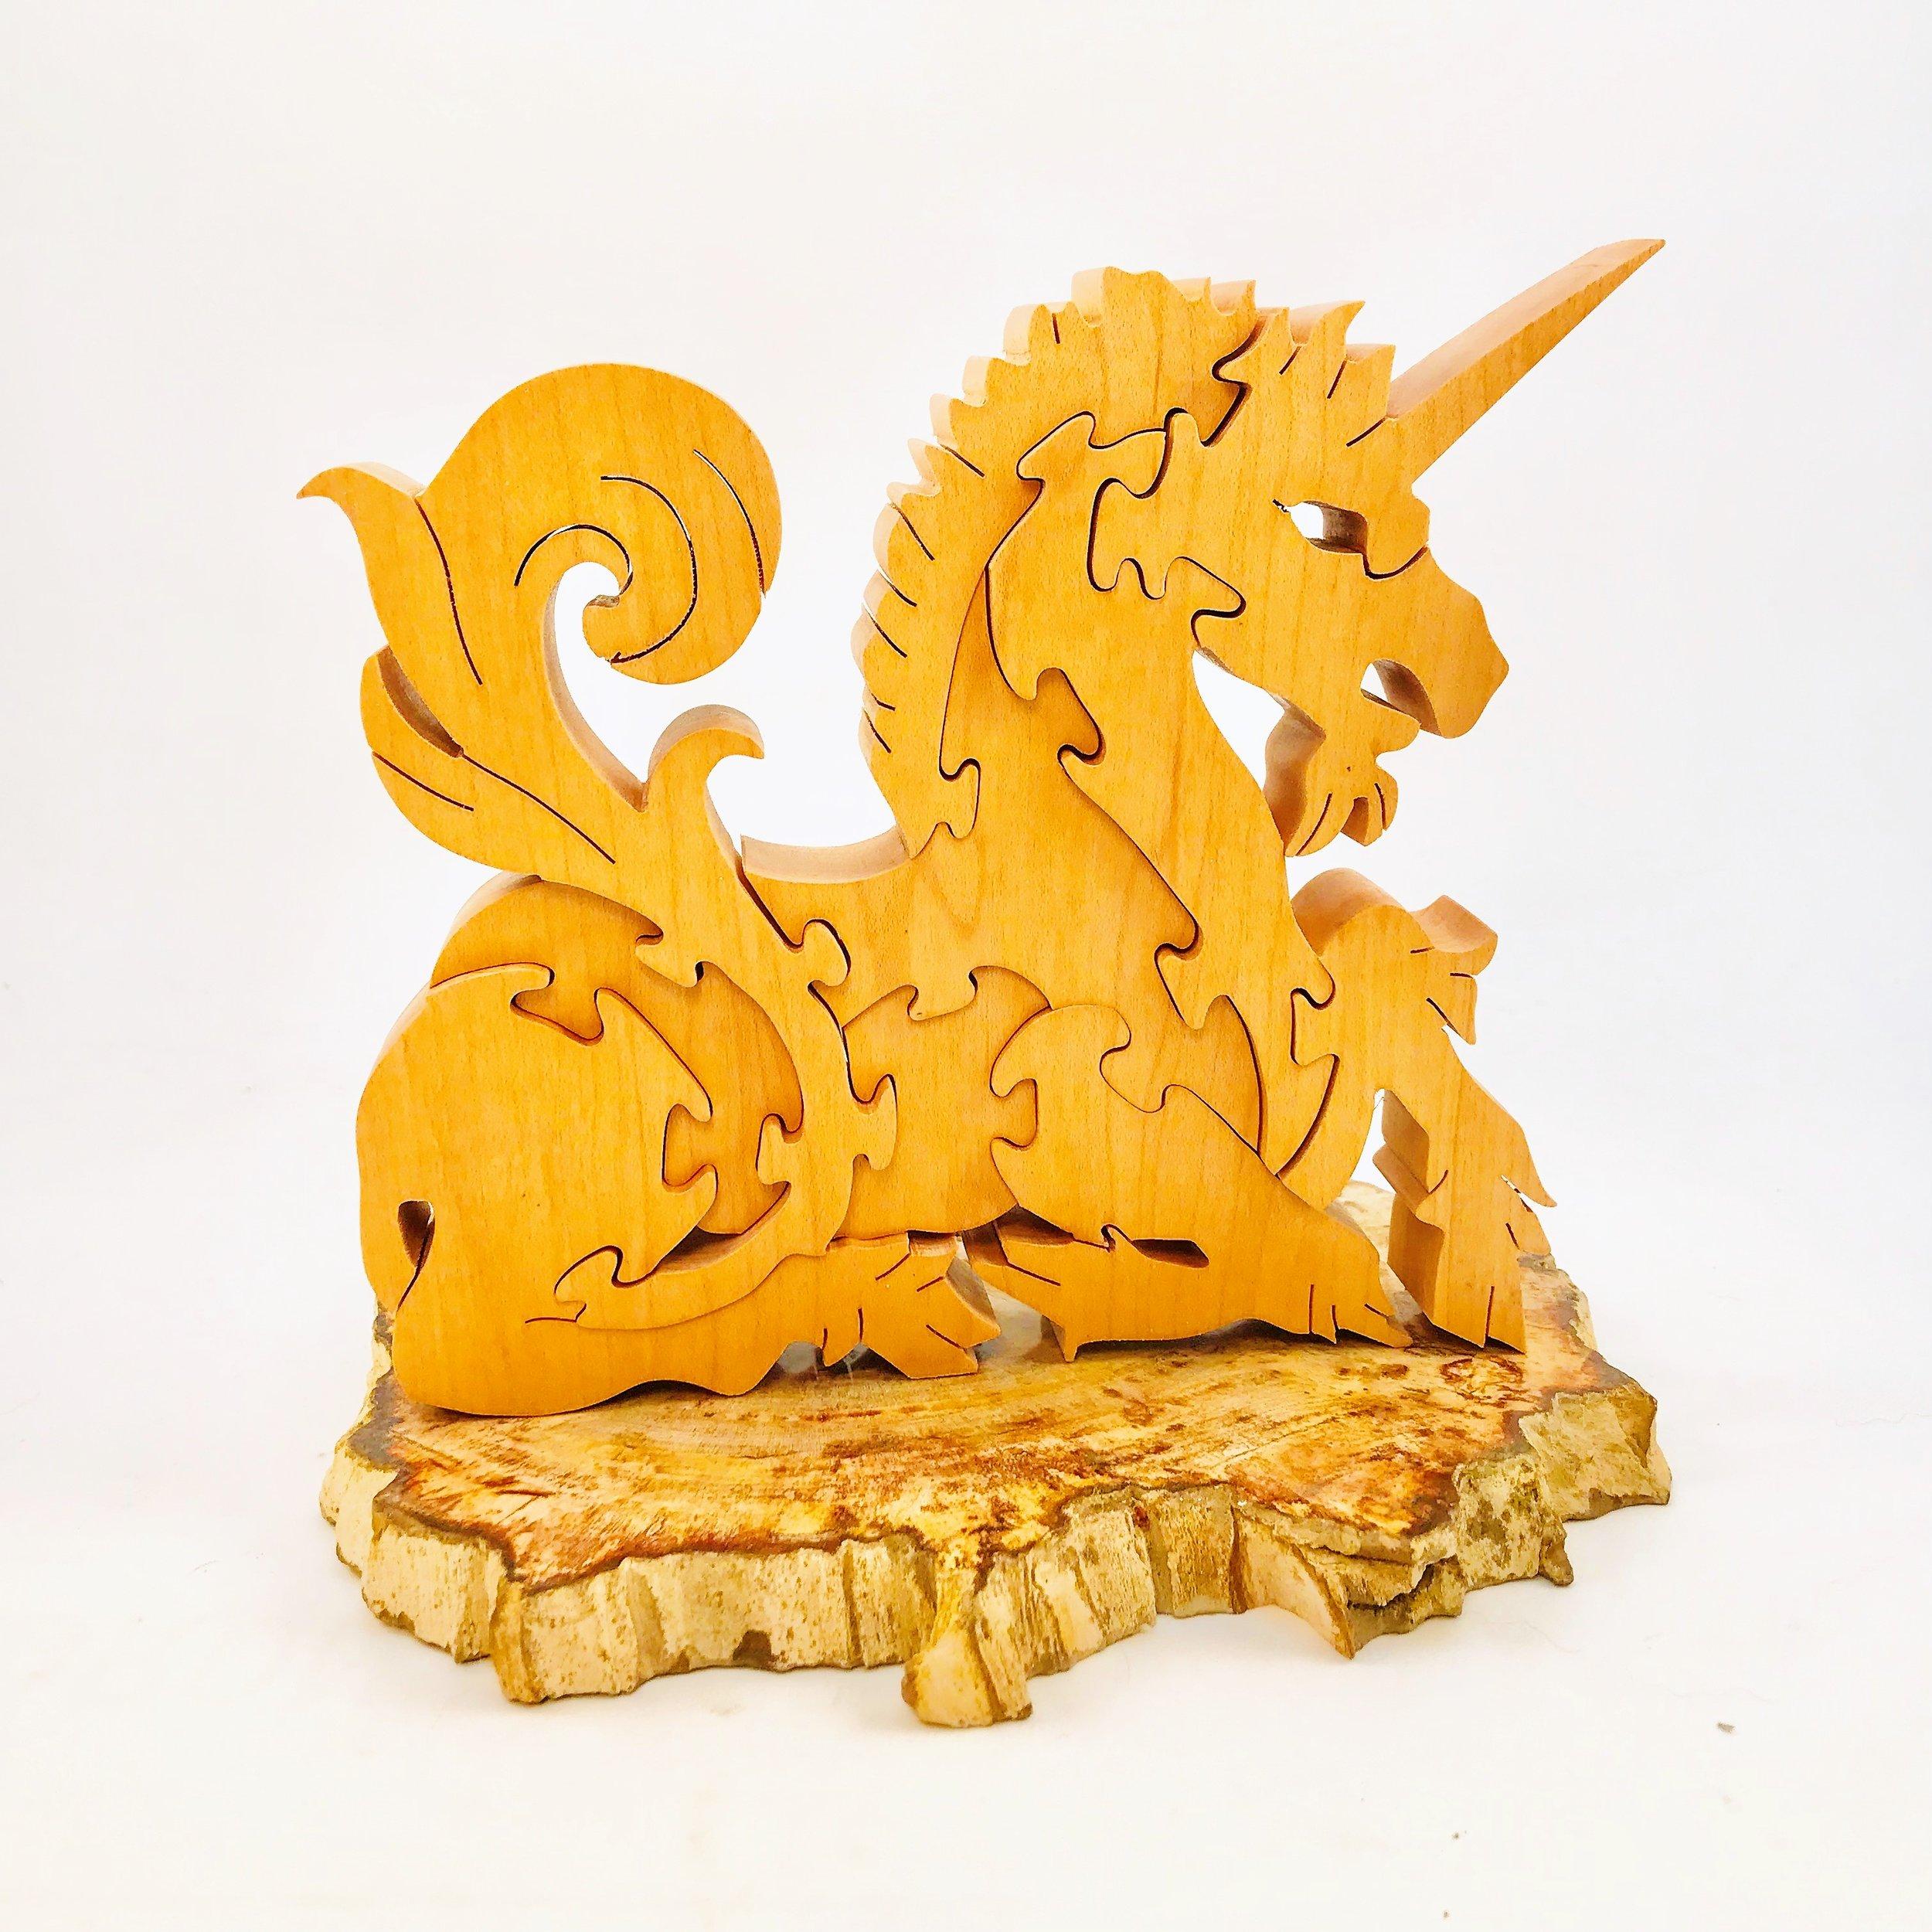 1983 3-D Jigsaw Stand up Puzzle \u2013 Unicorn